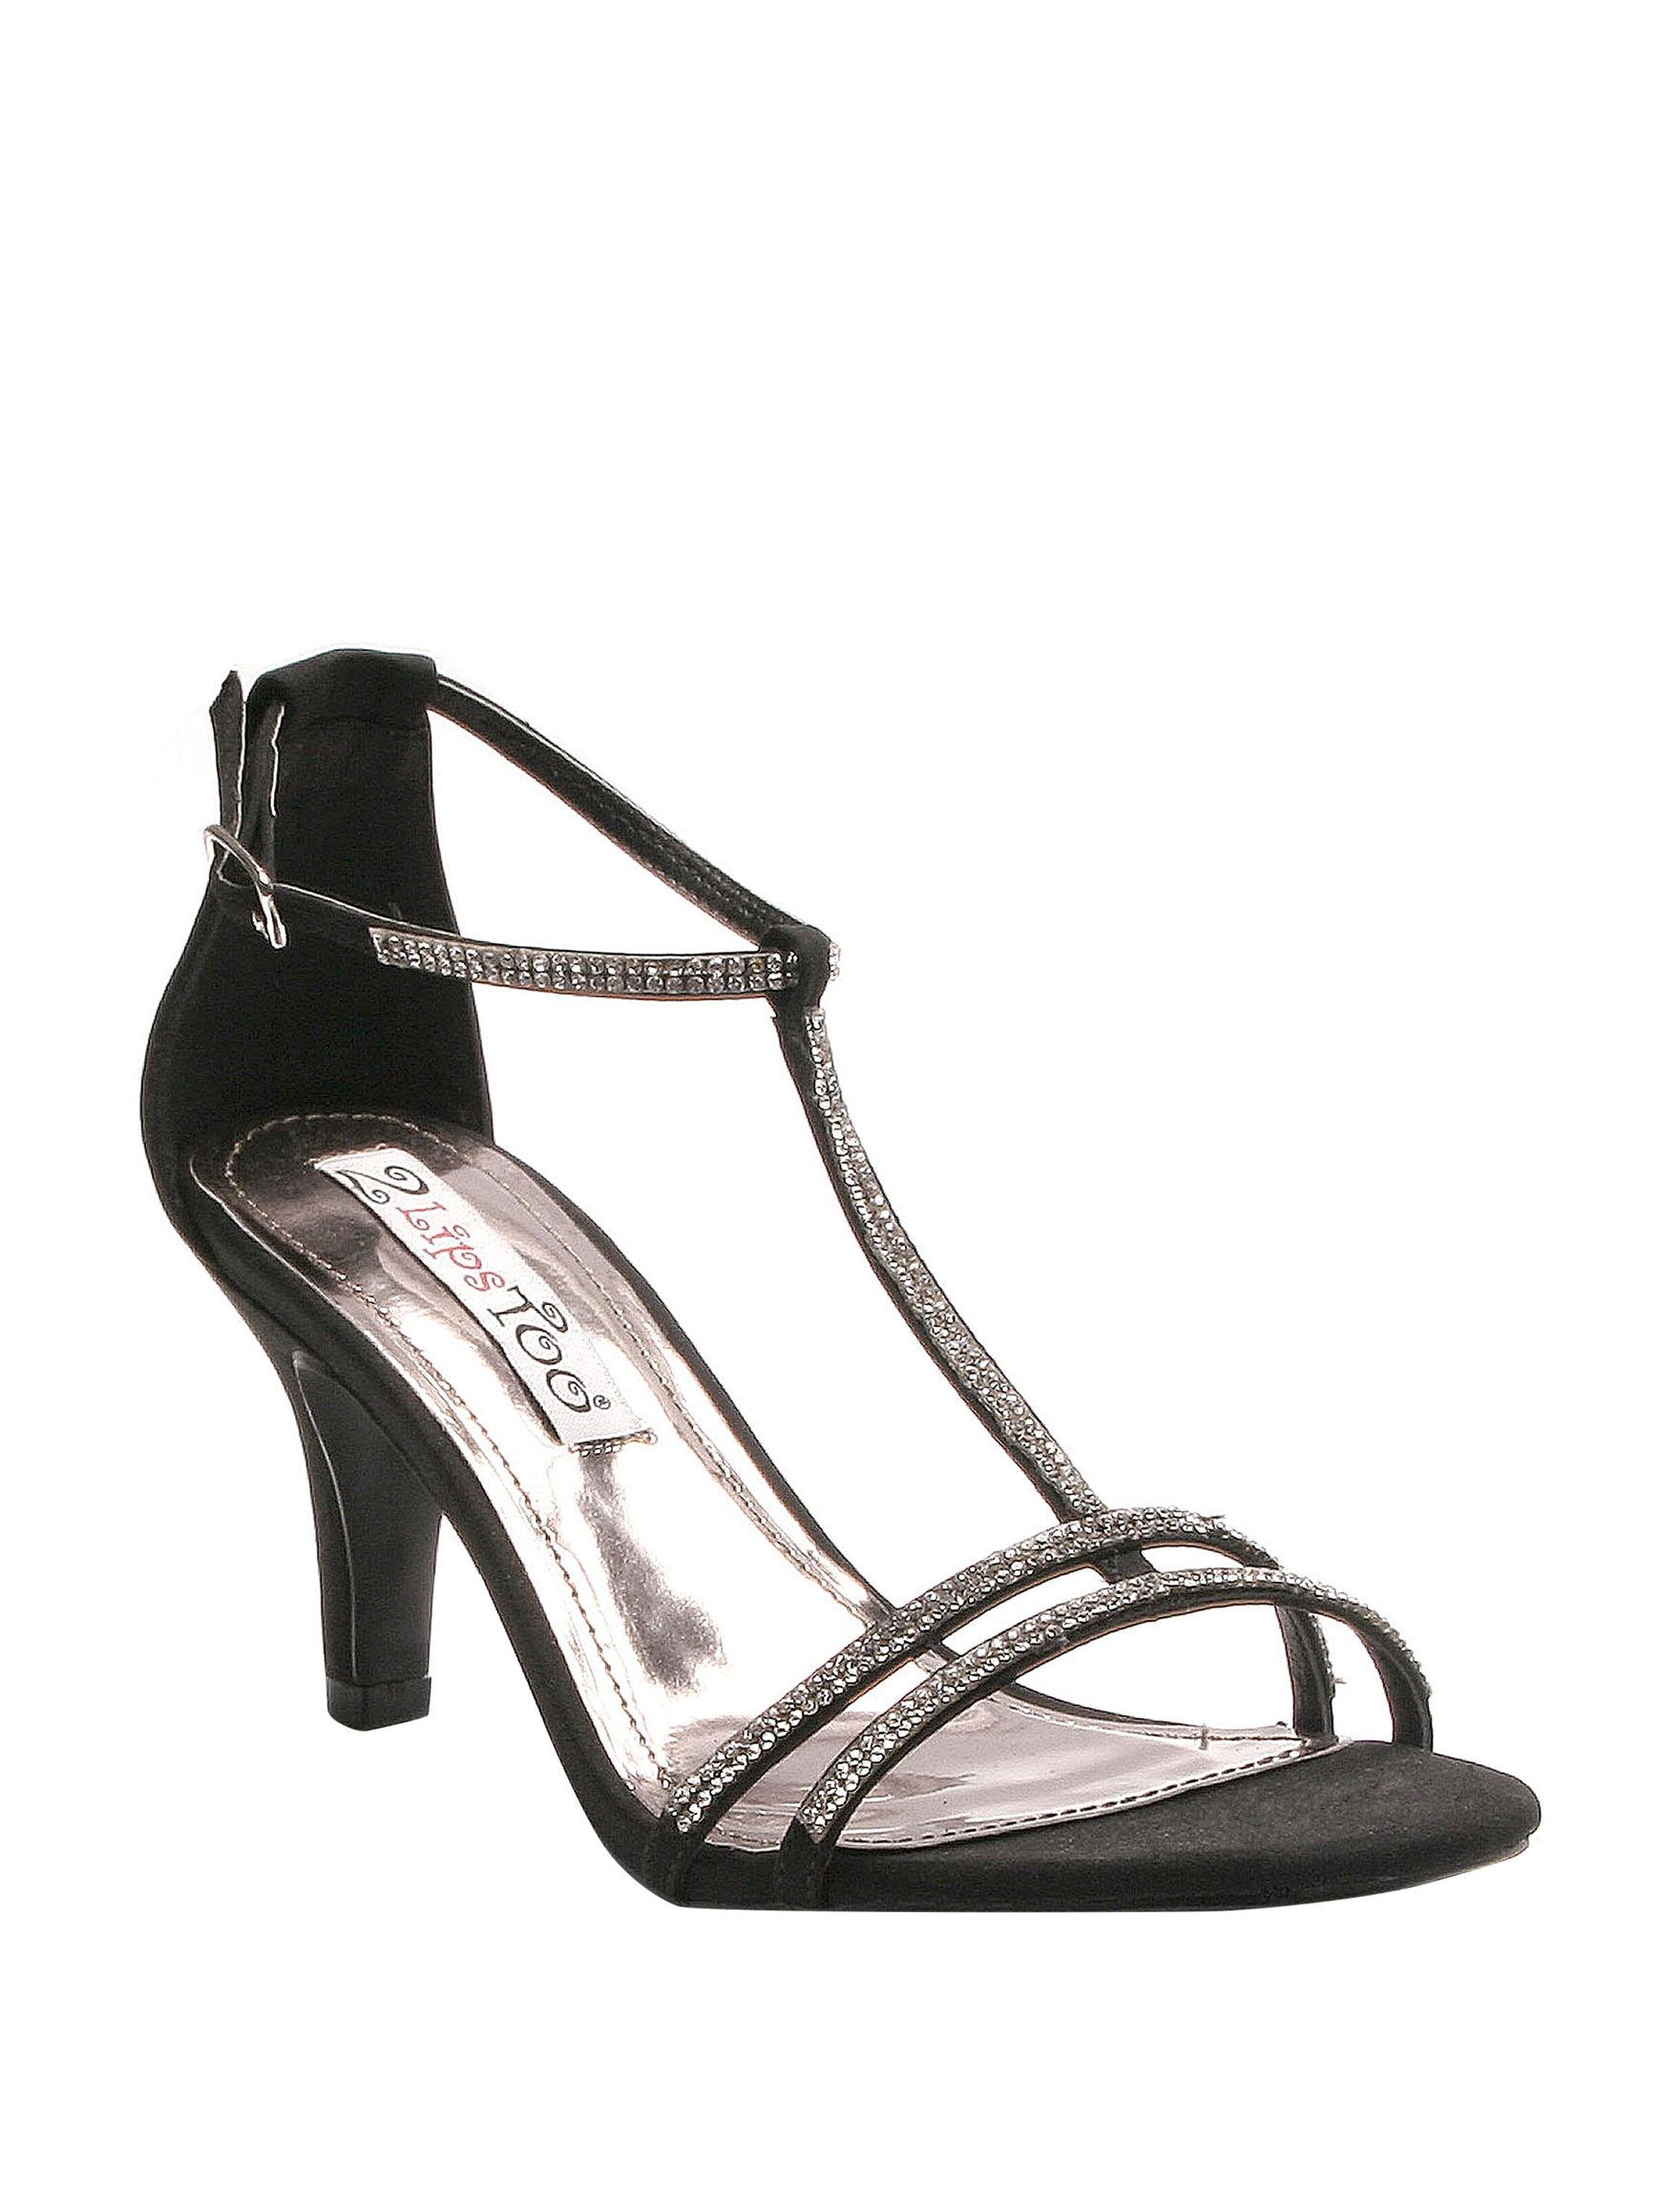 2 Lips Too Black Heeled Sandals